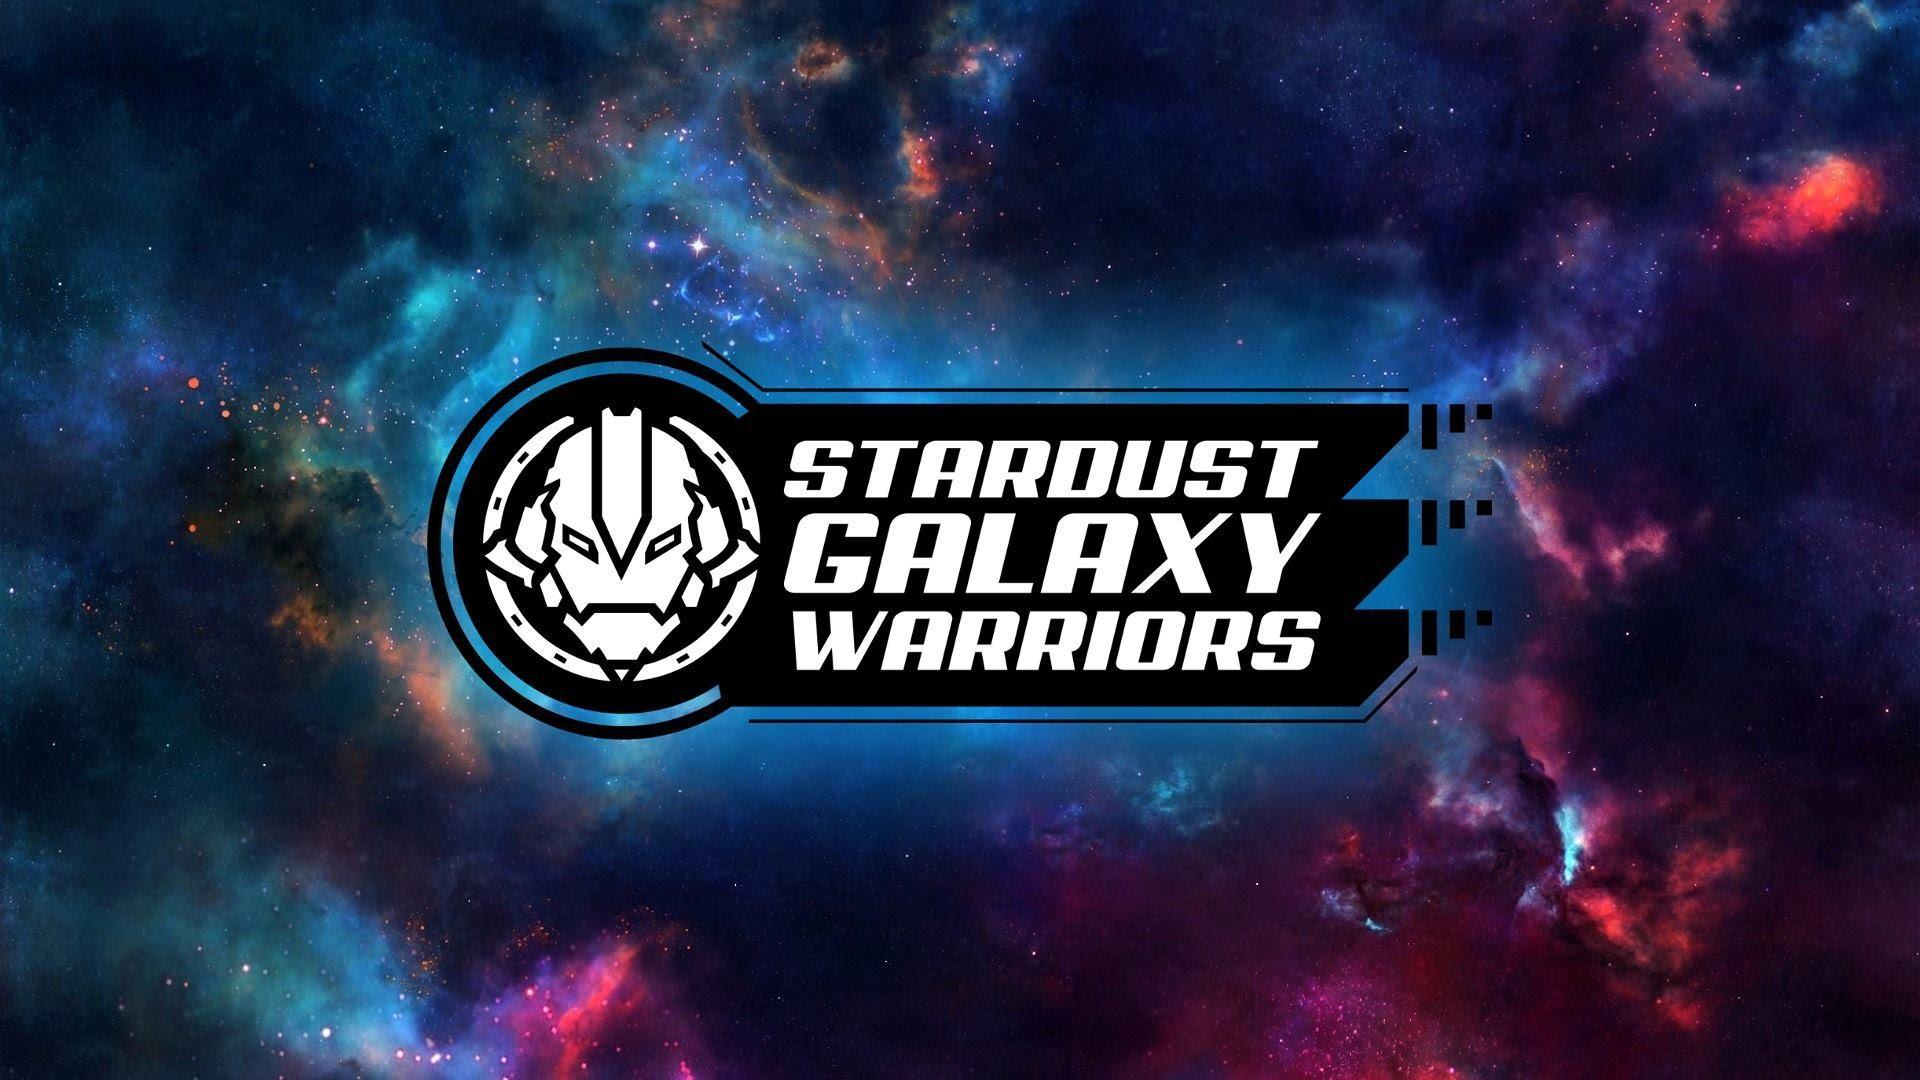 Stardust Galaxy Warriors Released On Steam